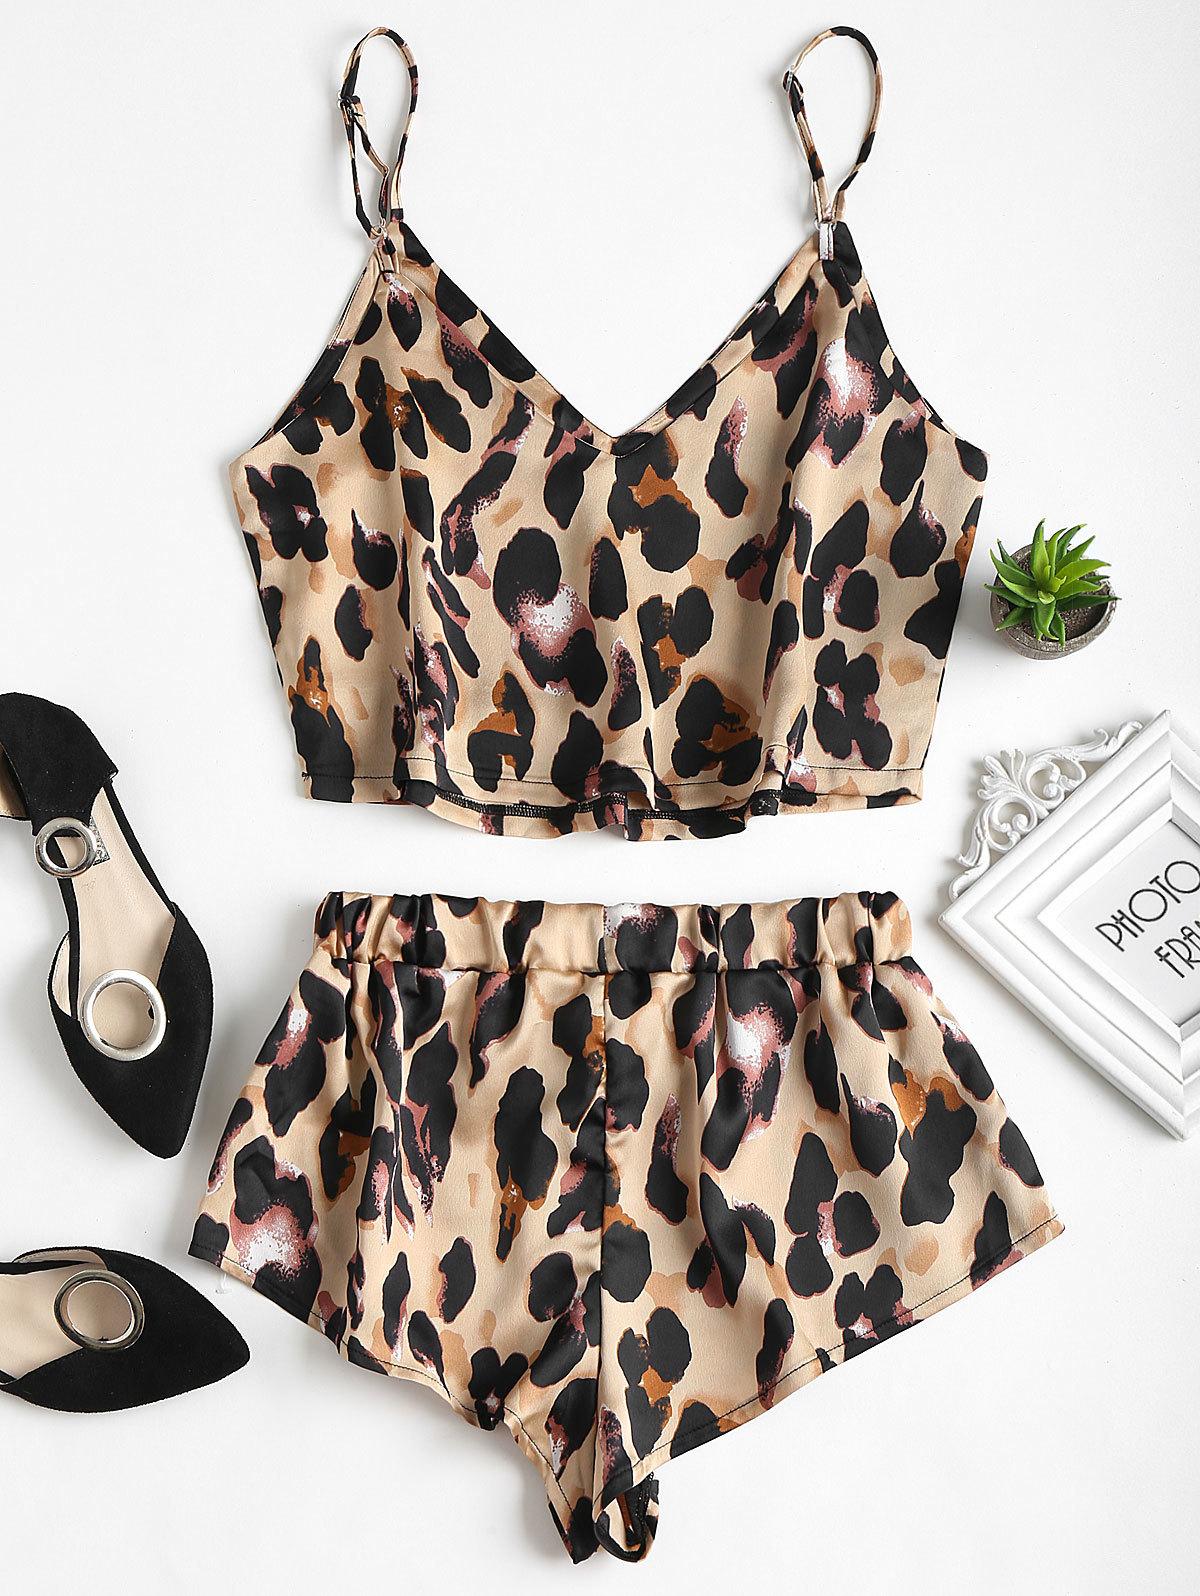 Wipalo Sexy Summer Pajamas Sleepwear Women Sleeveless Spaghetti Strap Nightwear Leopard Print Satin Cami Top Shorts Pajama Sets